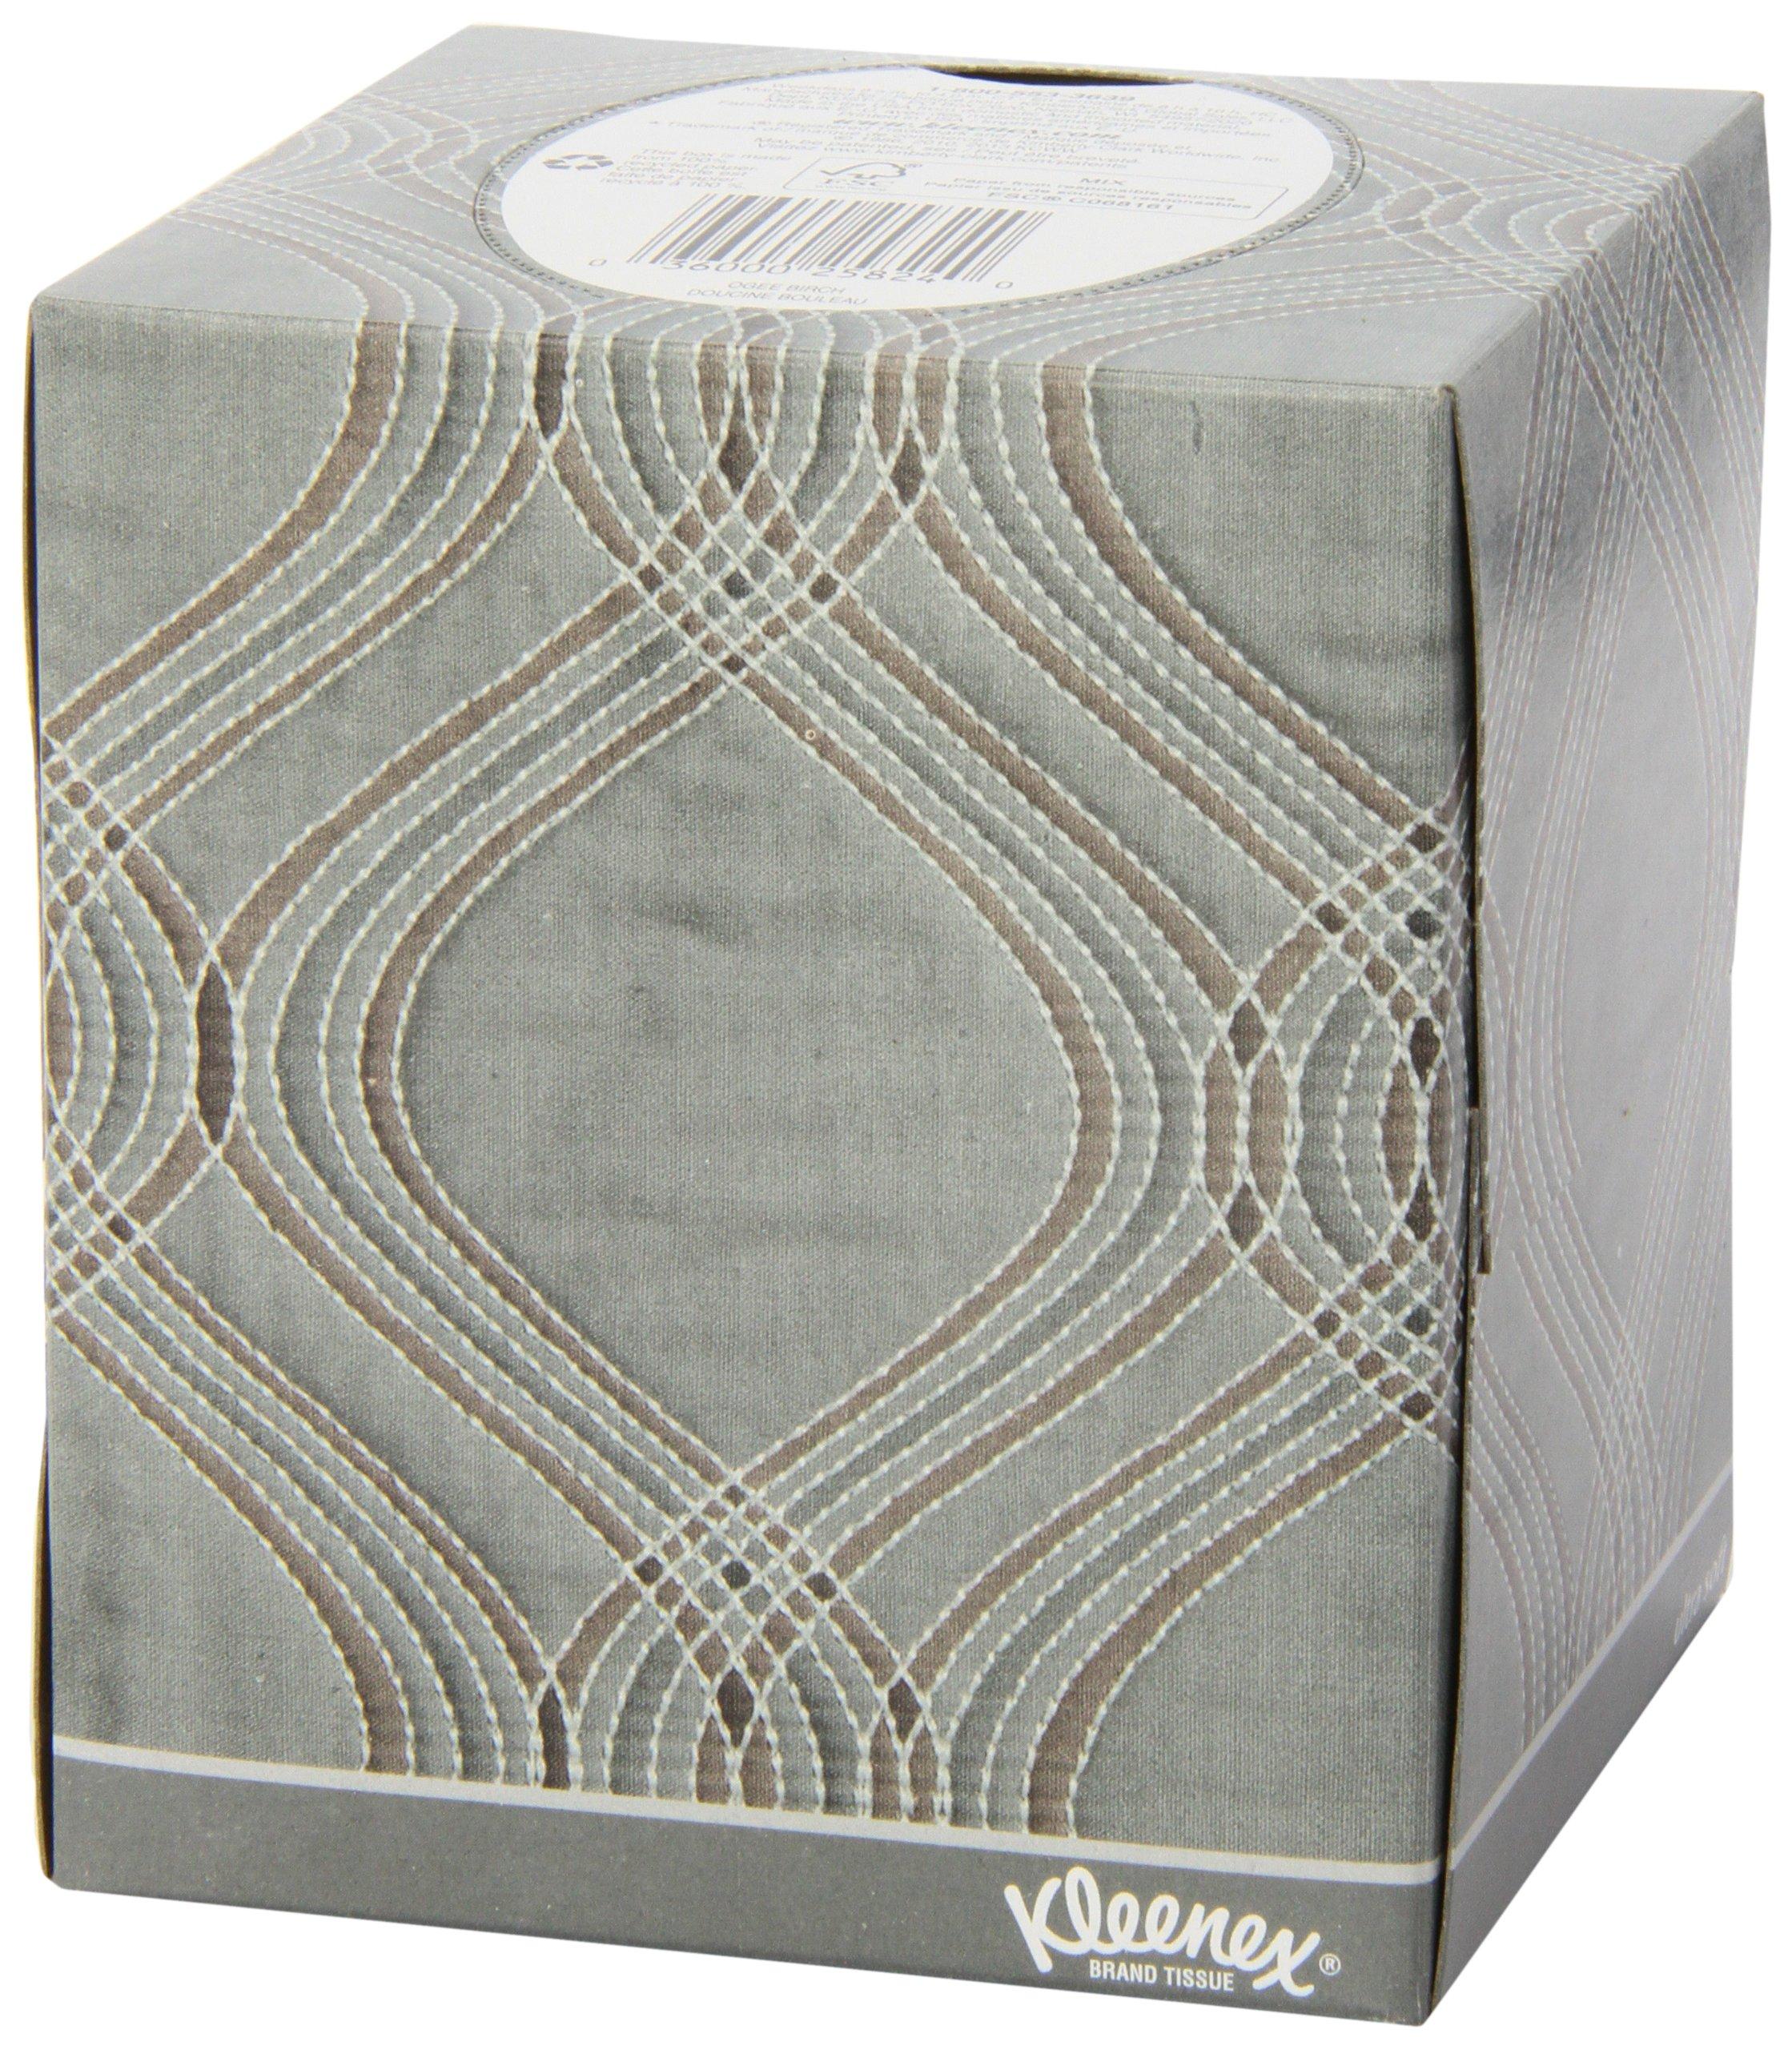 Kleenex Ultra Soft Facial Tissues, 75 Tissues per Cube Box, Pack of 27